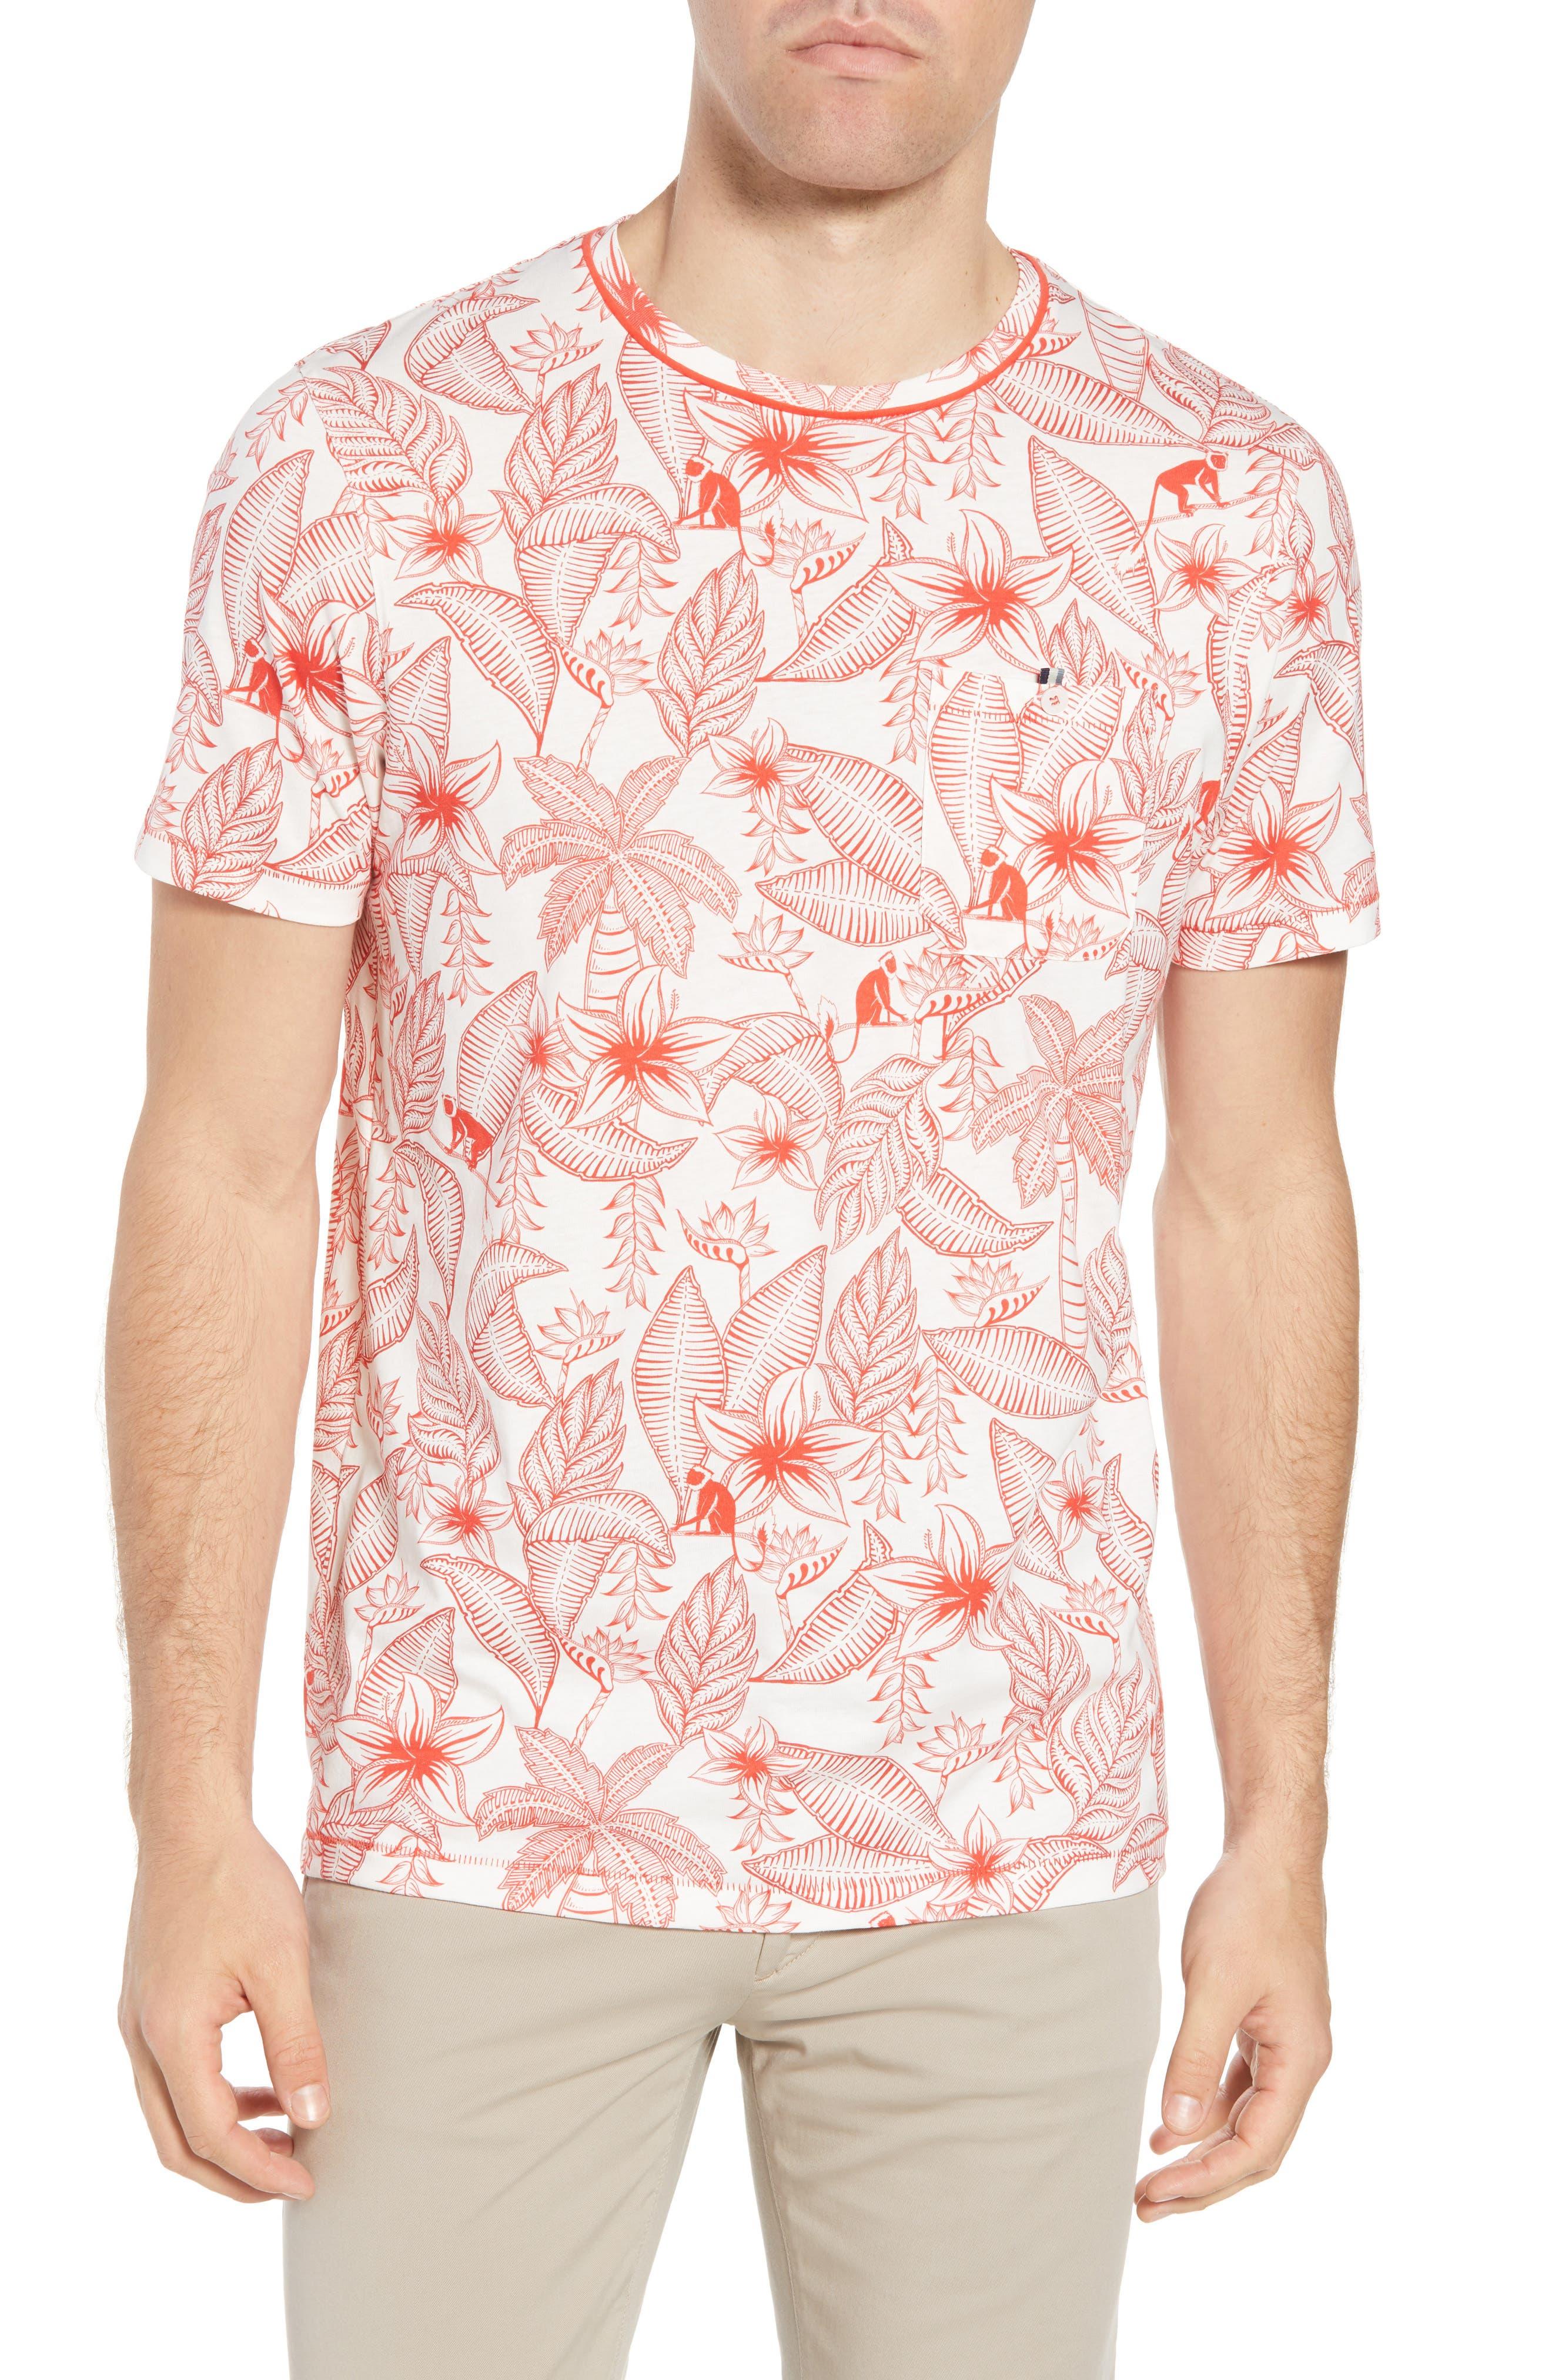 Bengel Crewneck T-Shirt,                         Main,                         color, Red